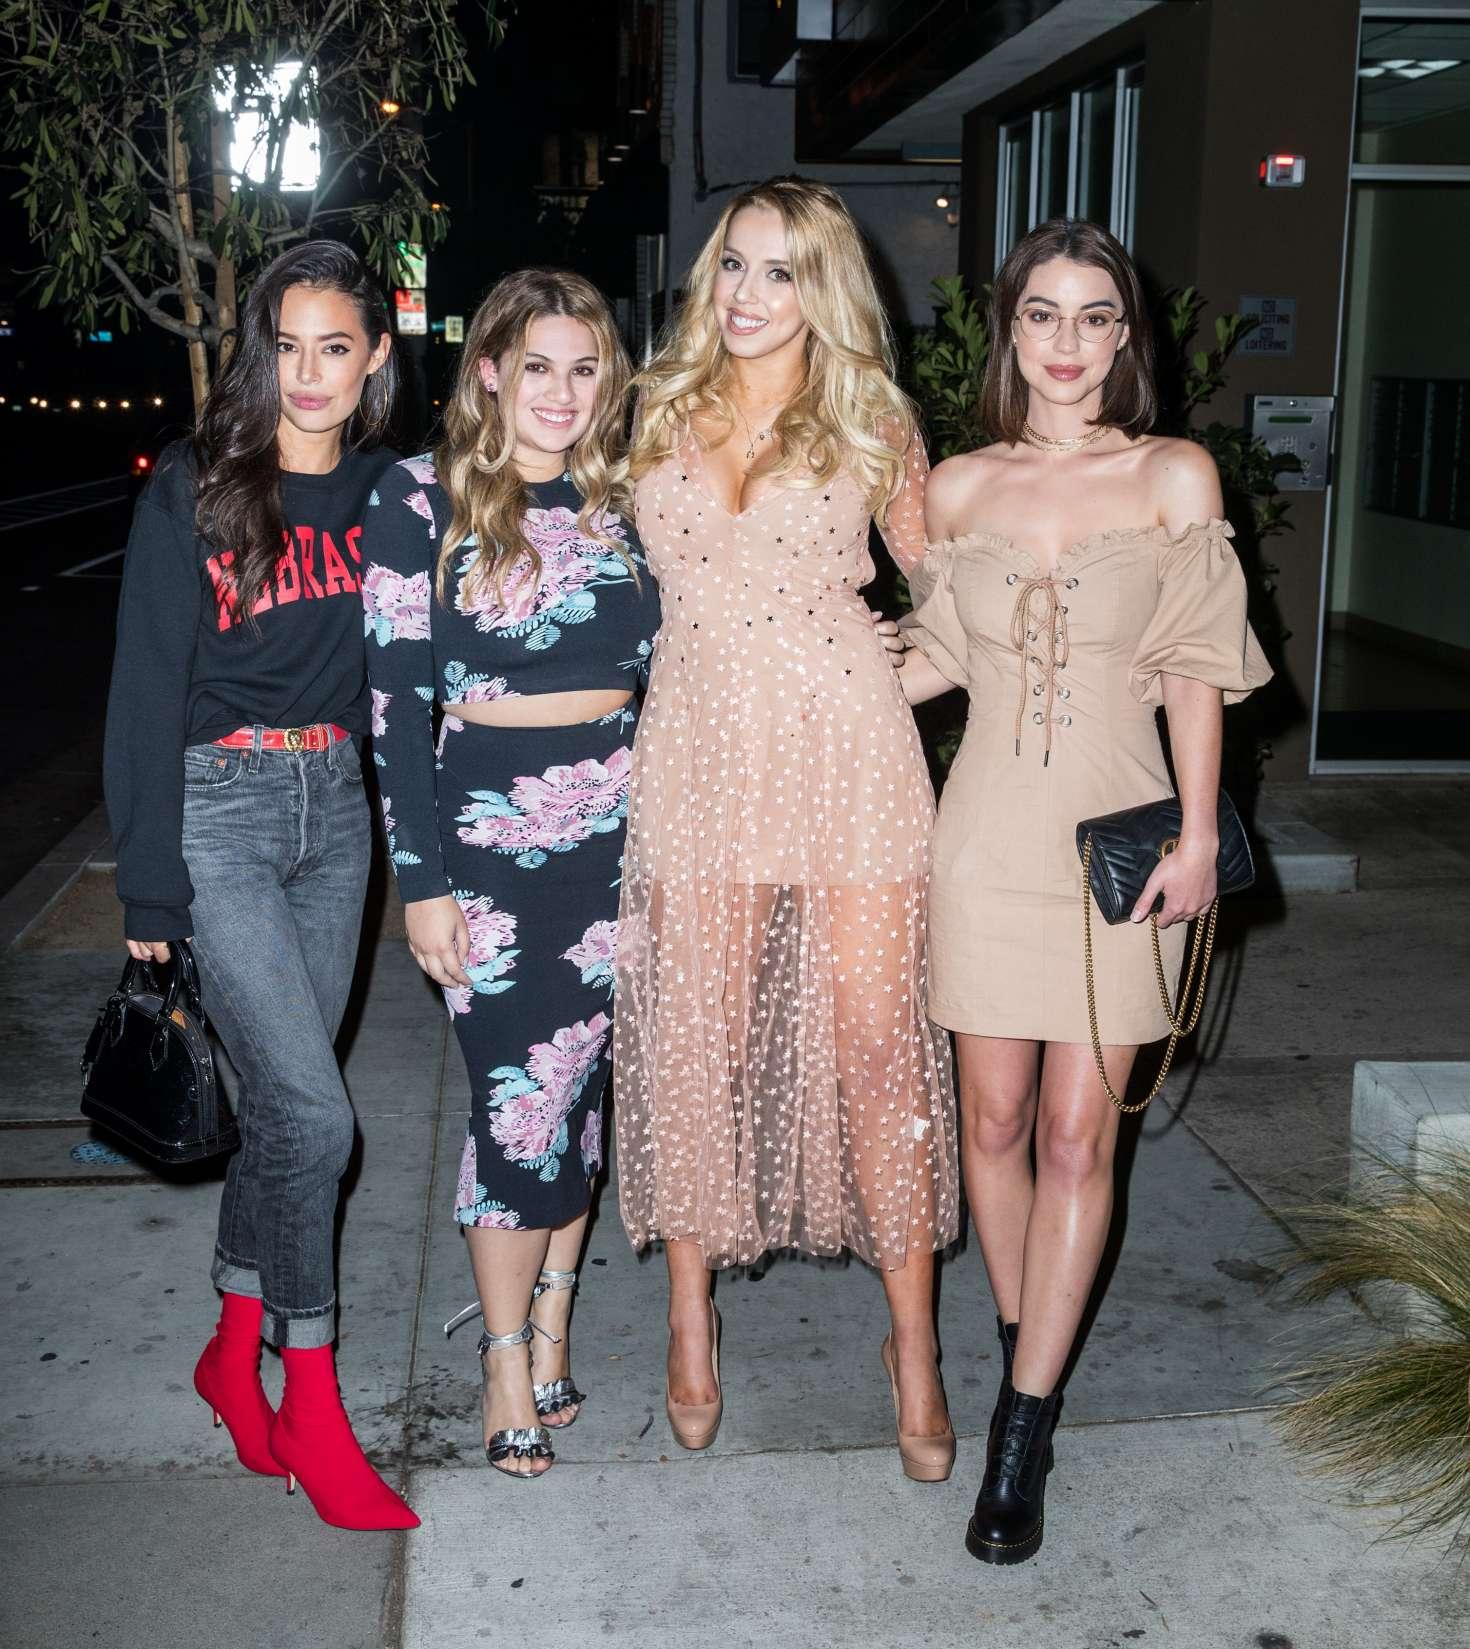 Violet Benson, Chloe Bridges and Adelaide Kane - Violet Benson's Birthday in West Hollywood